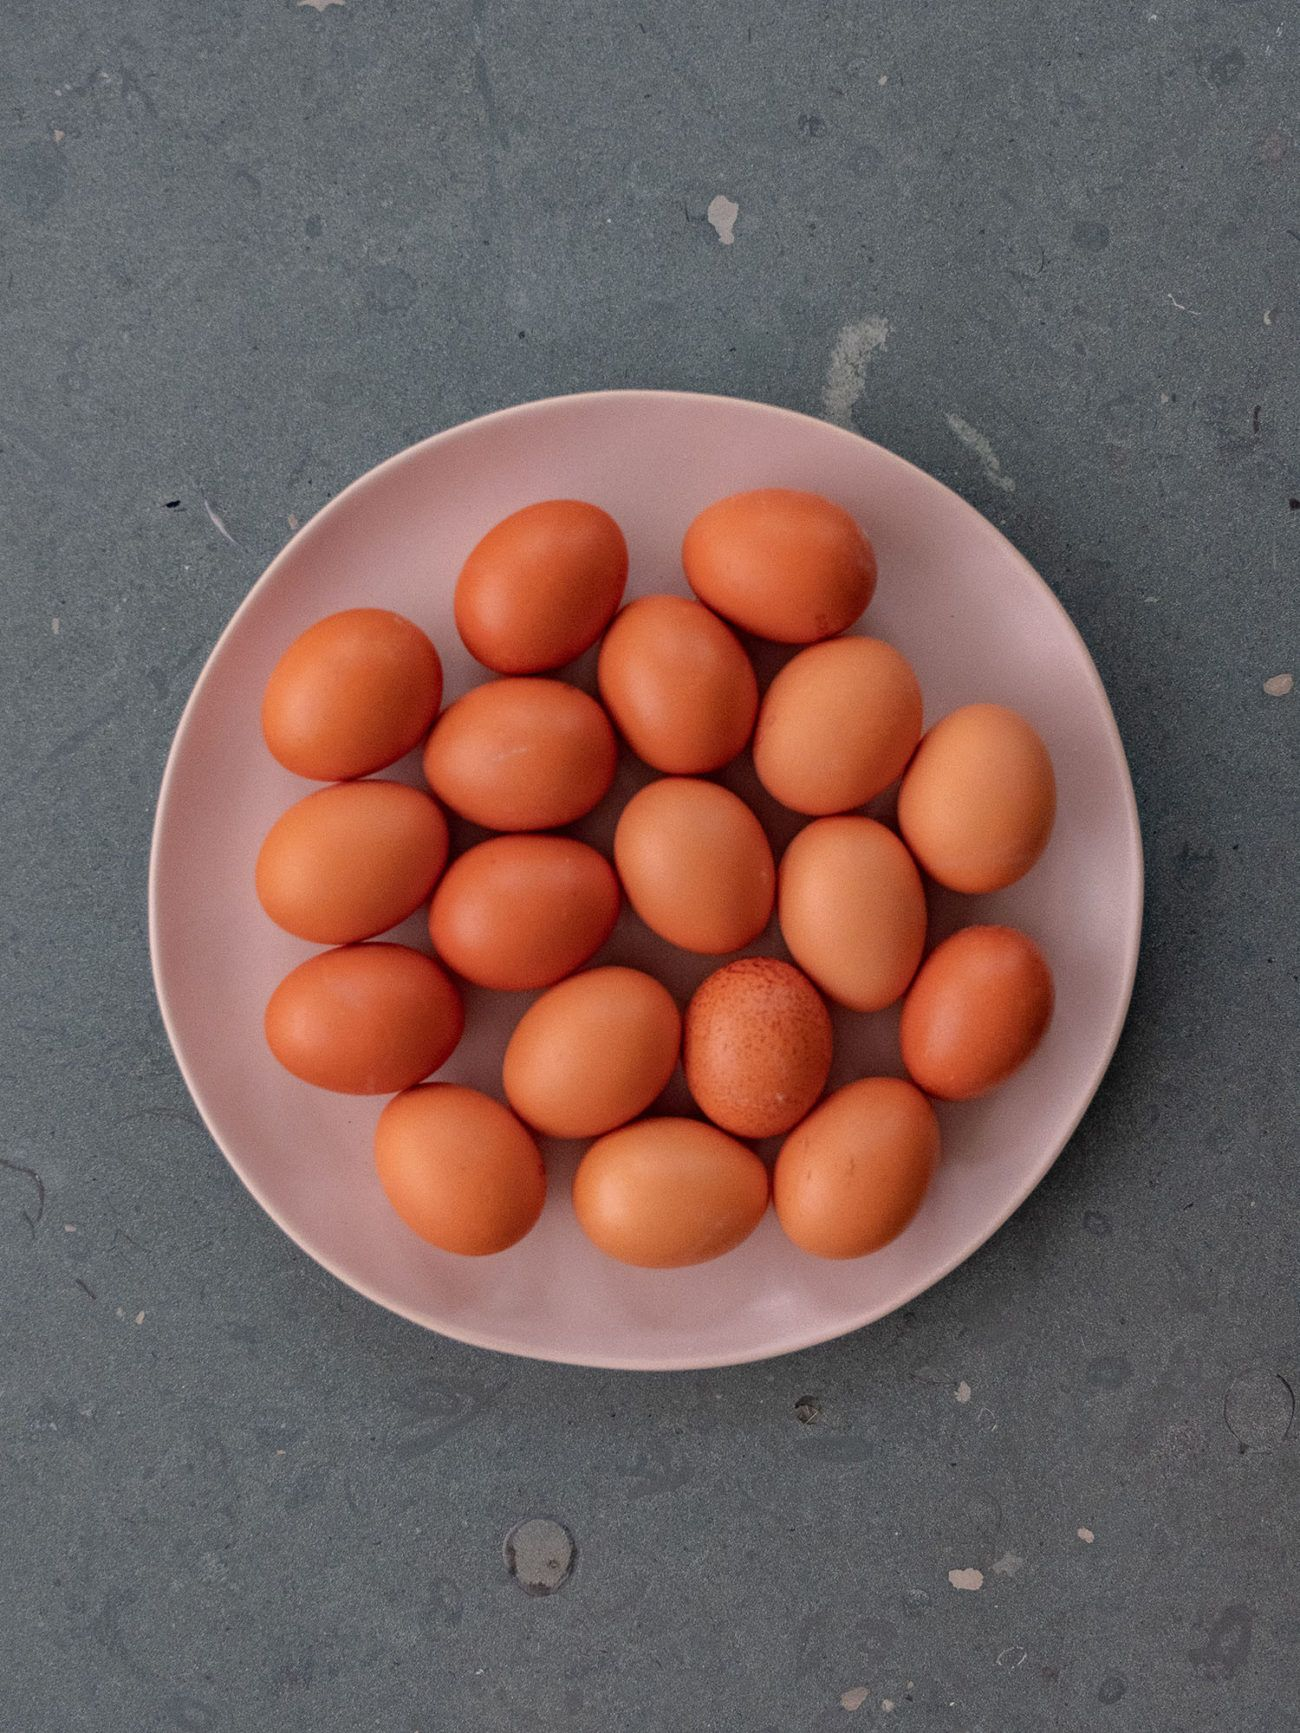 Rezept Omelette mit Spinatsalat, About Fuel, Eier